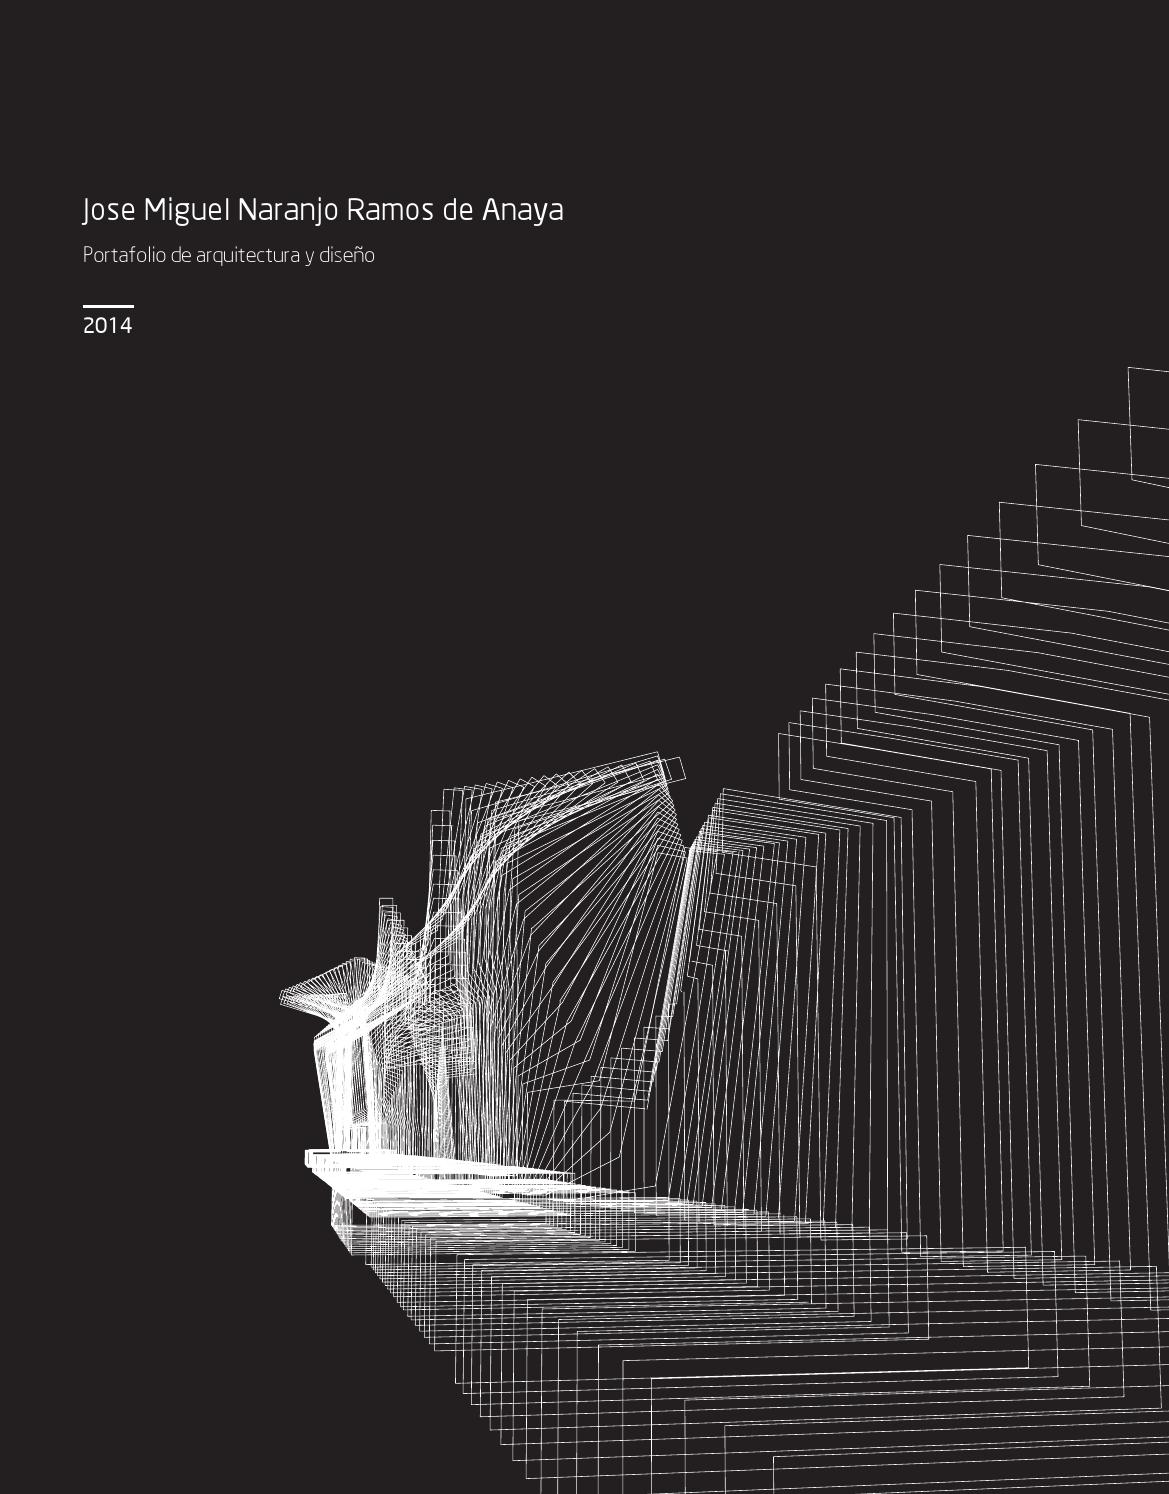 Portafolio arquitectura y dise o by jose m naranjo ramos - Arquitectura de diseno ...